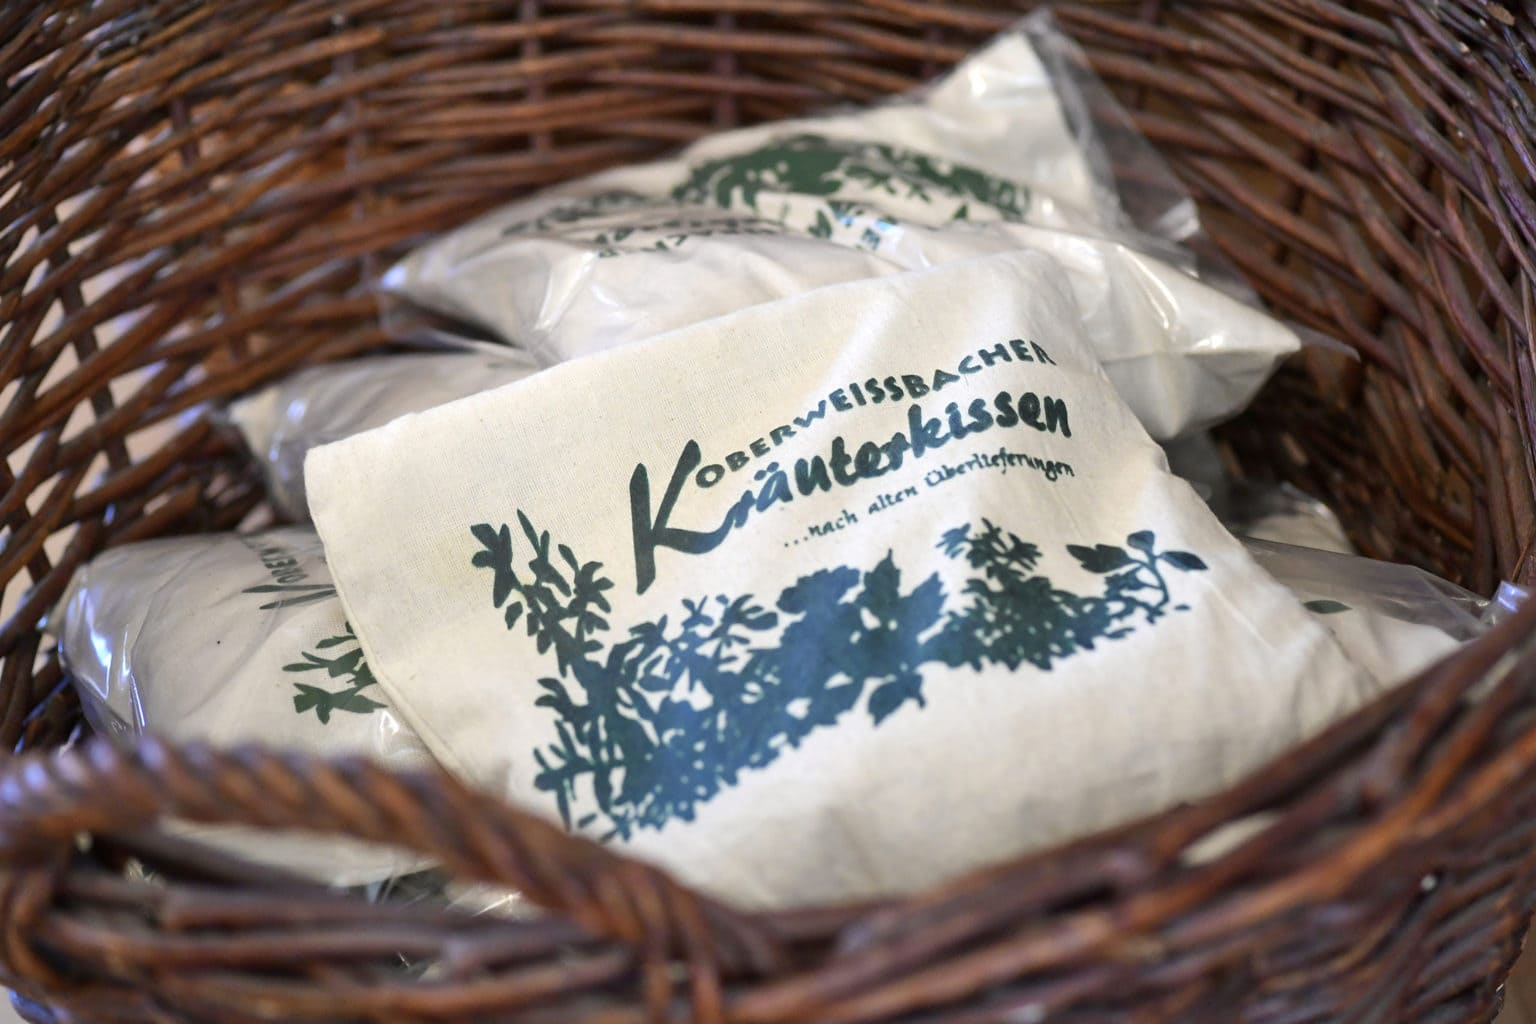 Kruidenkussens uit Thüringen